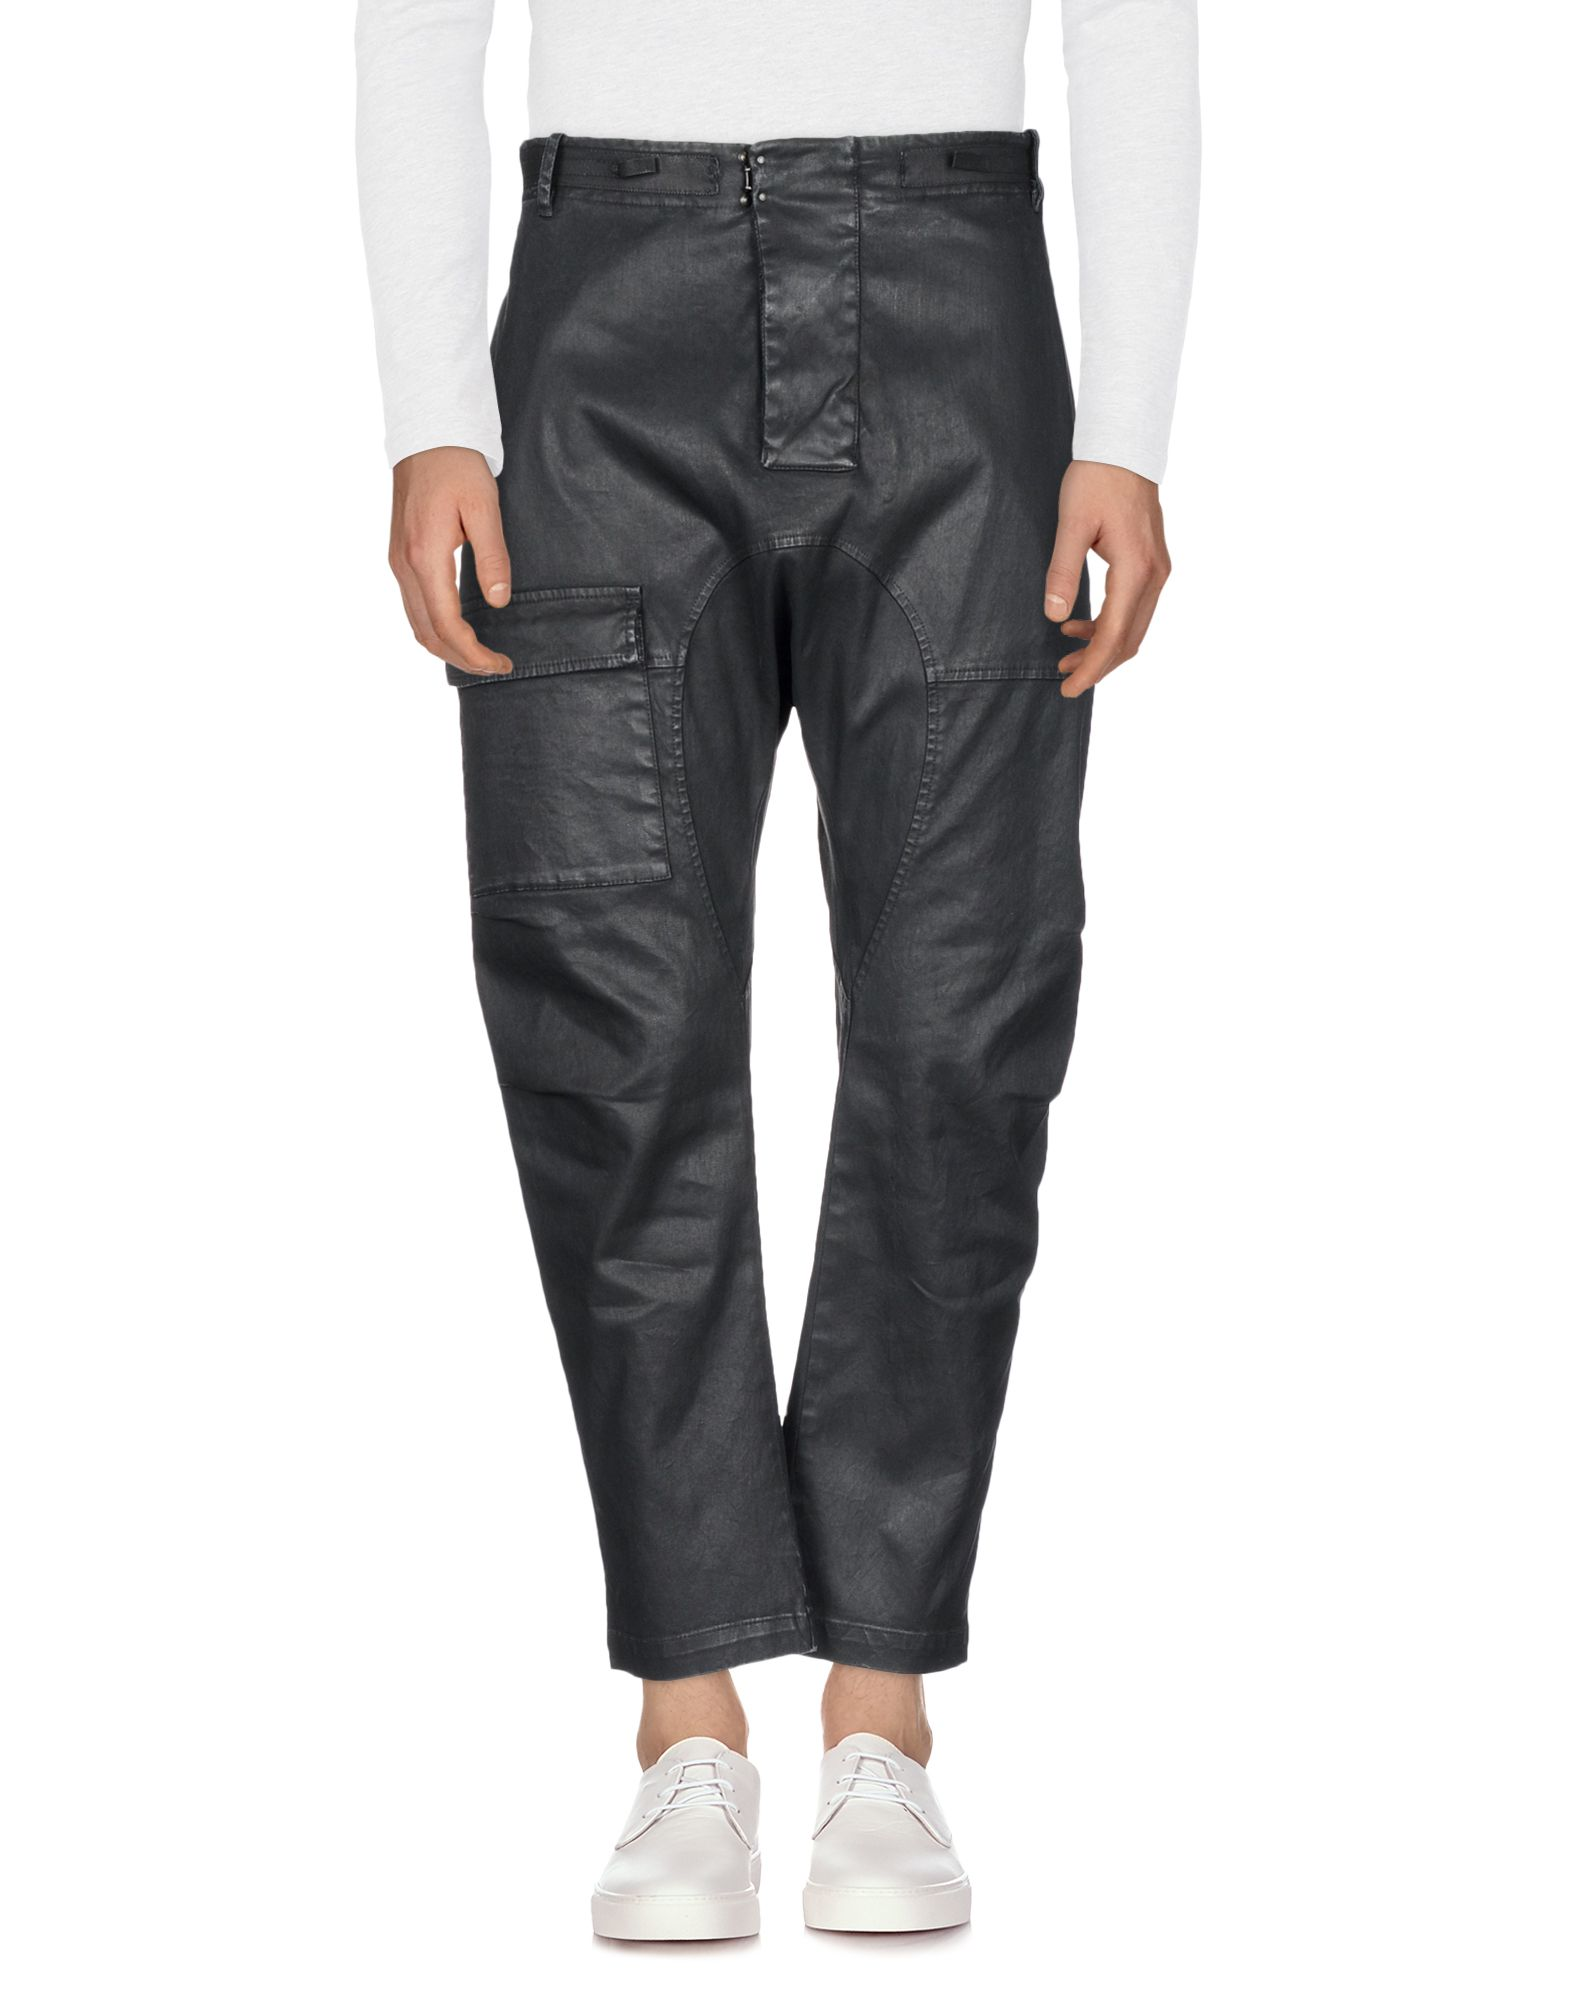 Pantaloni Jeans Tom Rebl Donna - Acquista online su